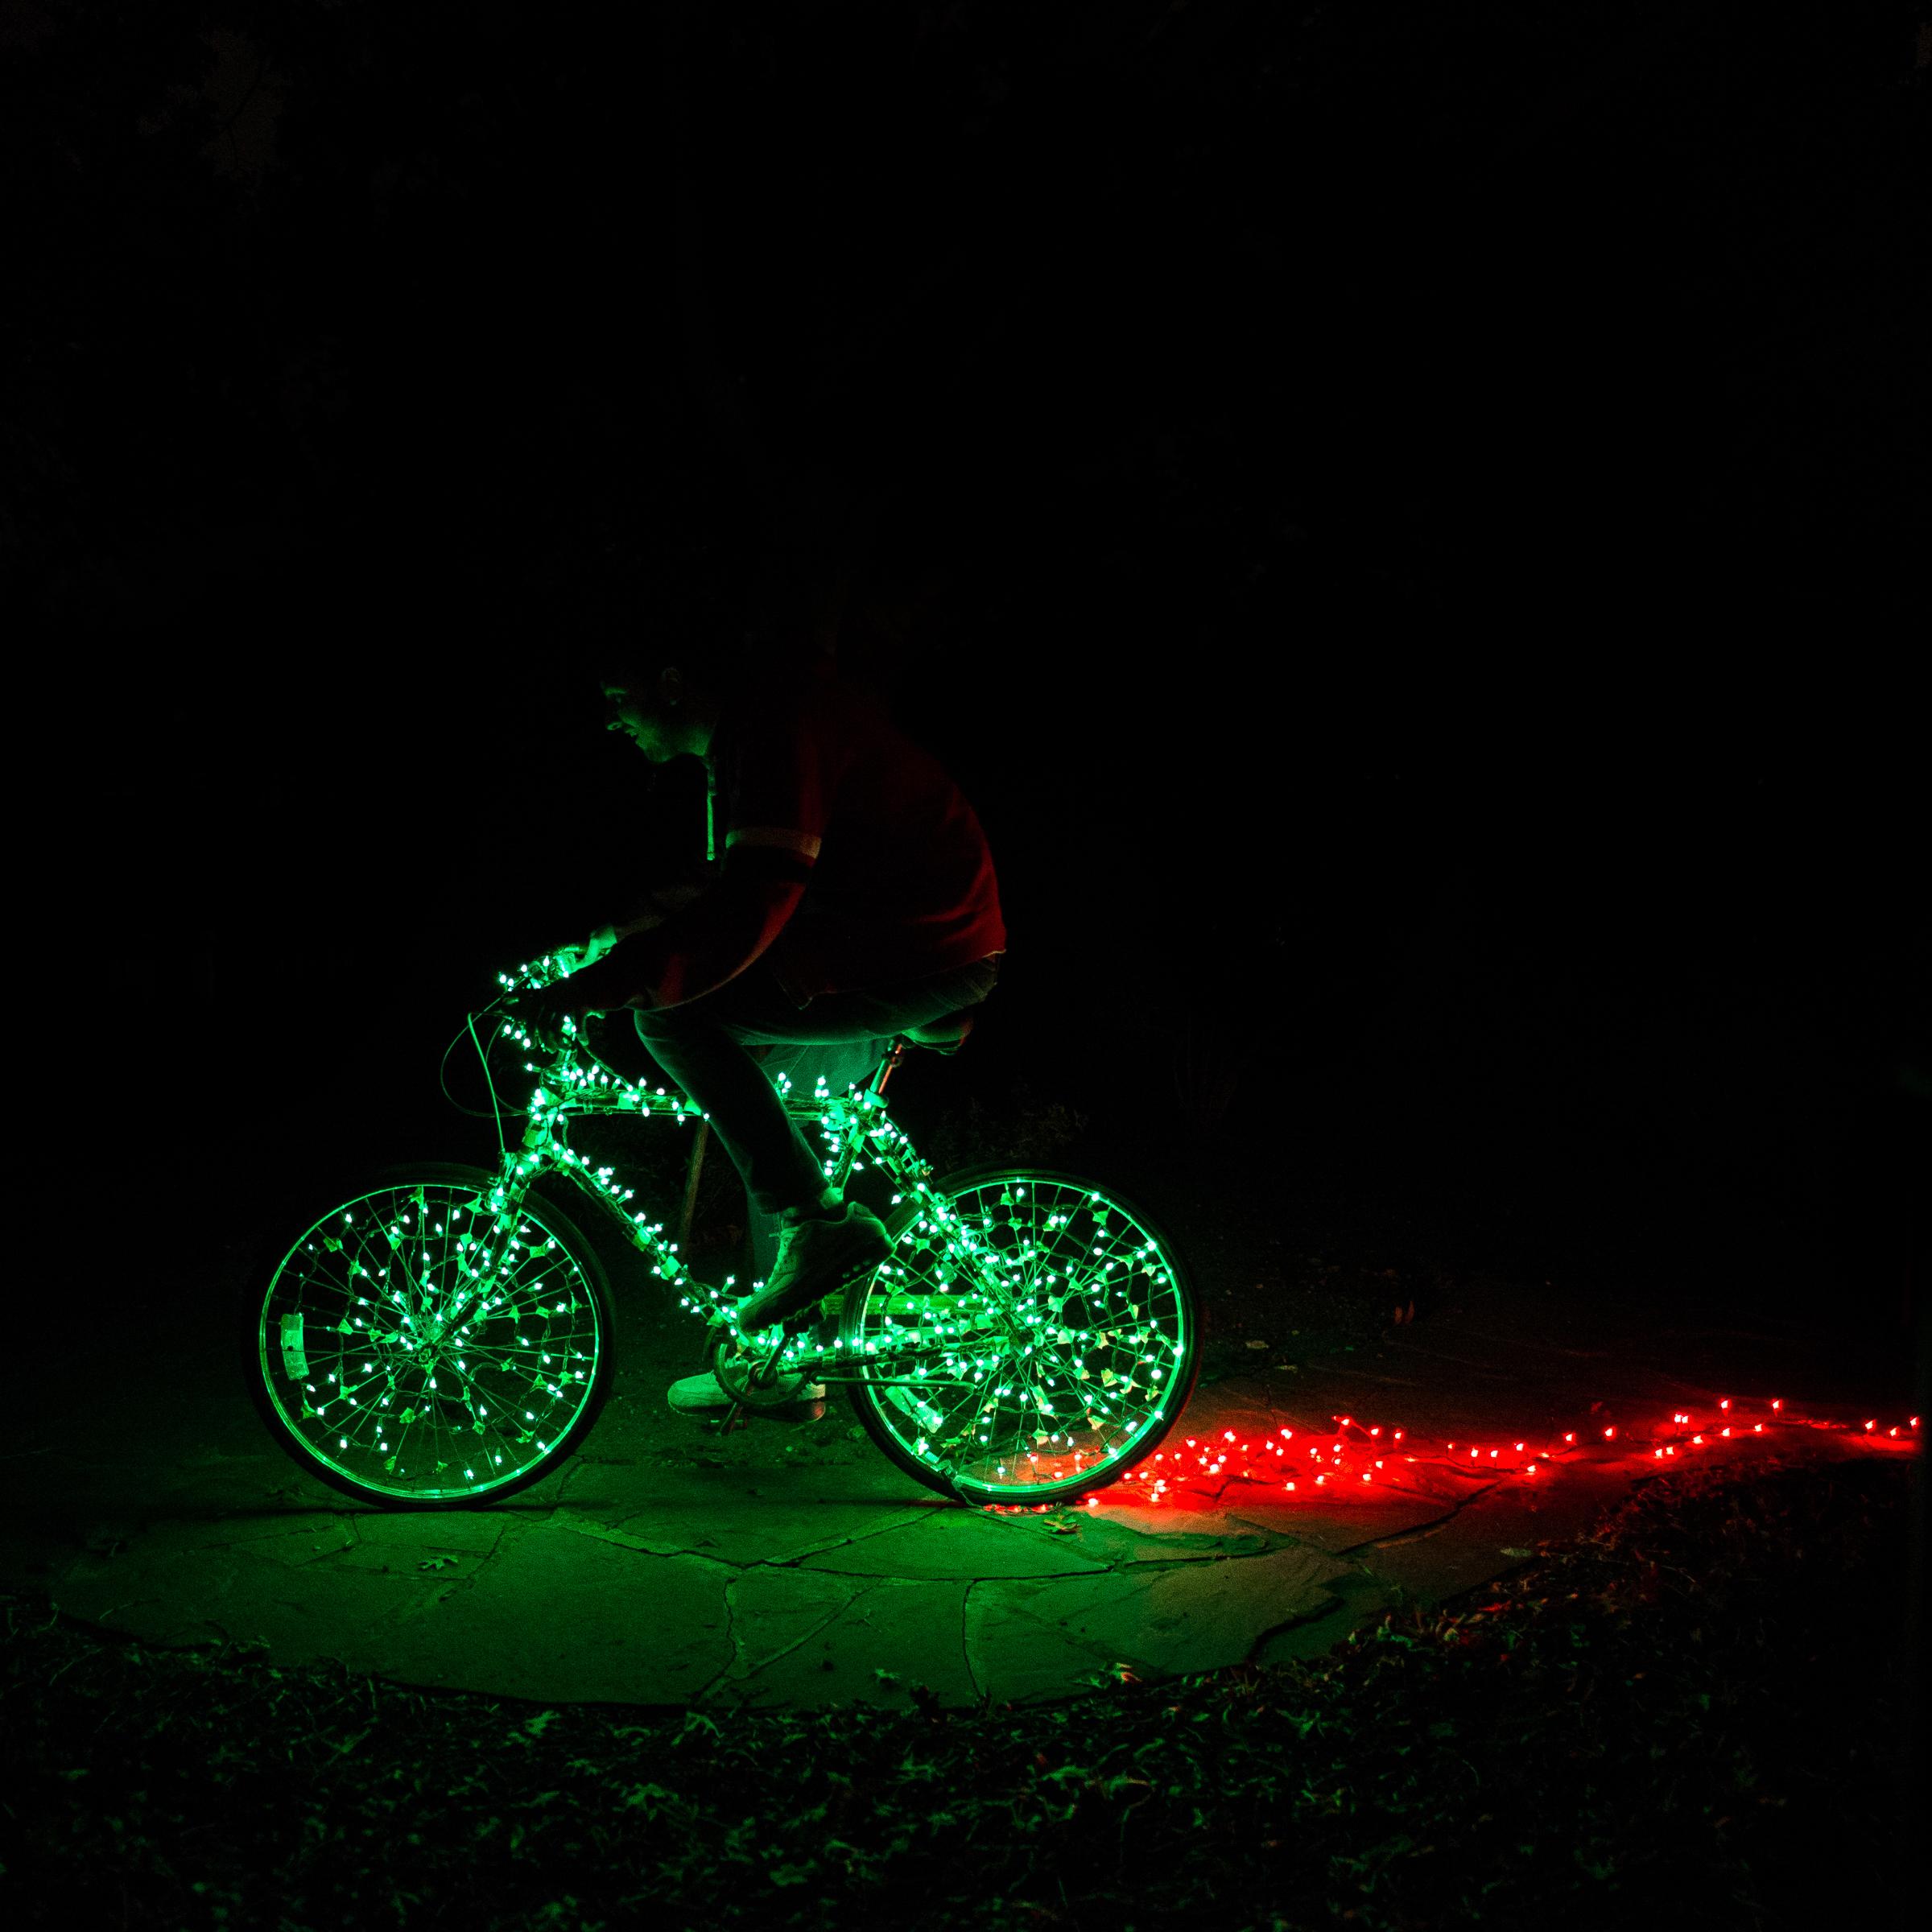 7up-bike in lights-final-2 (square) (final edit).jpg